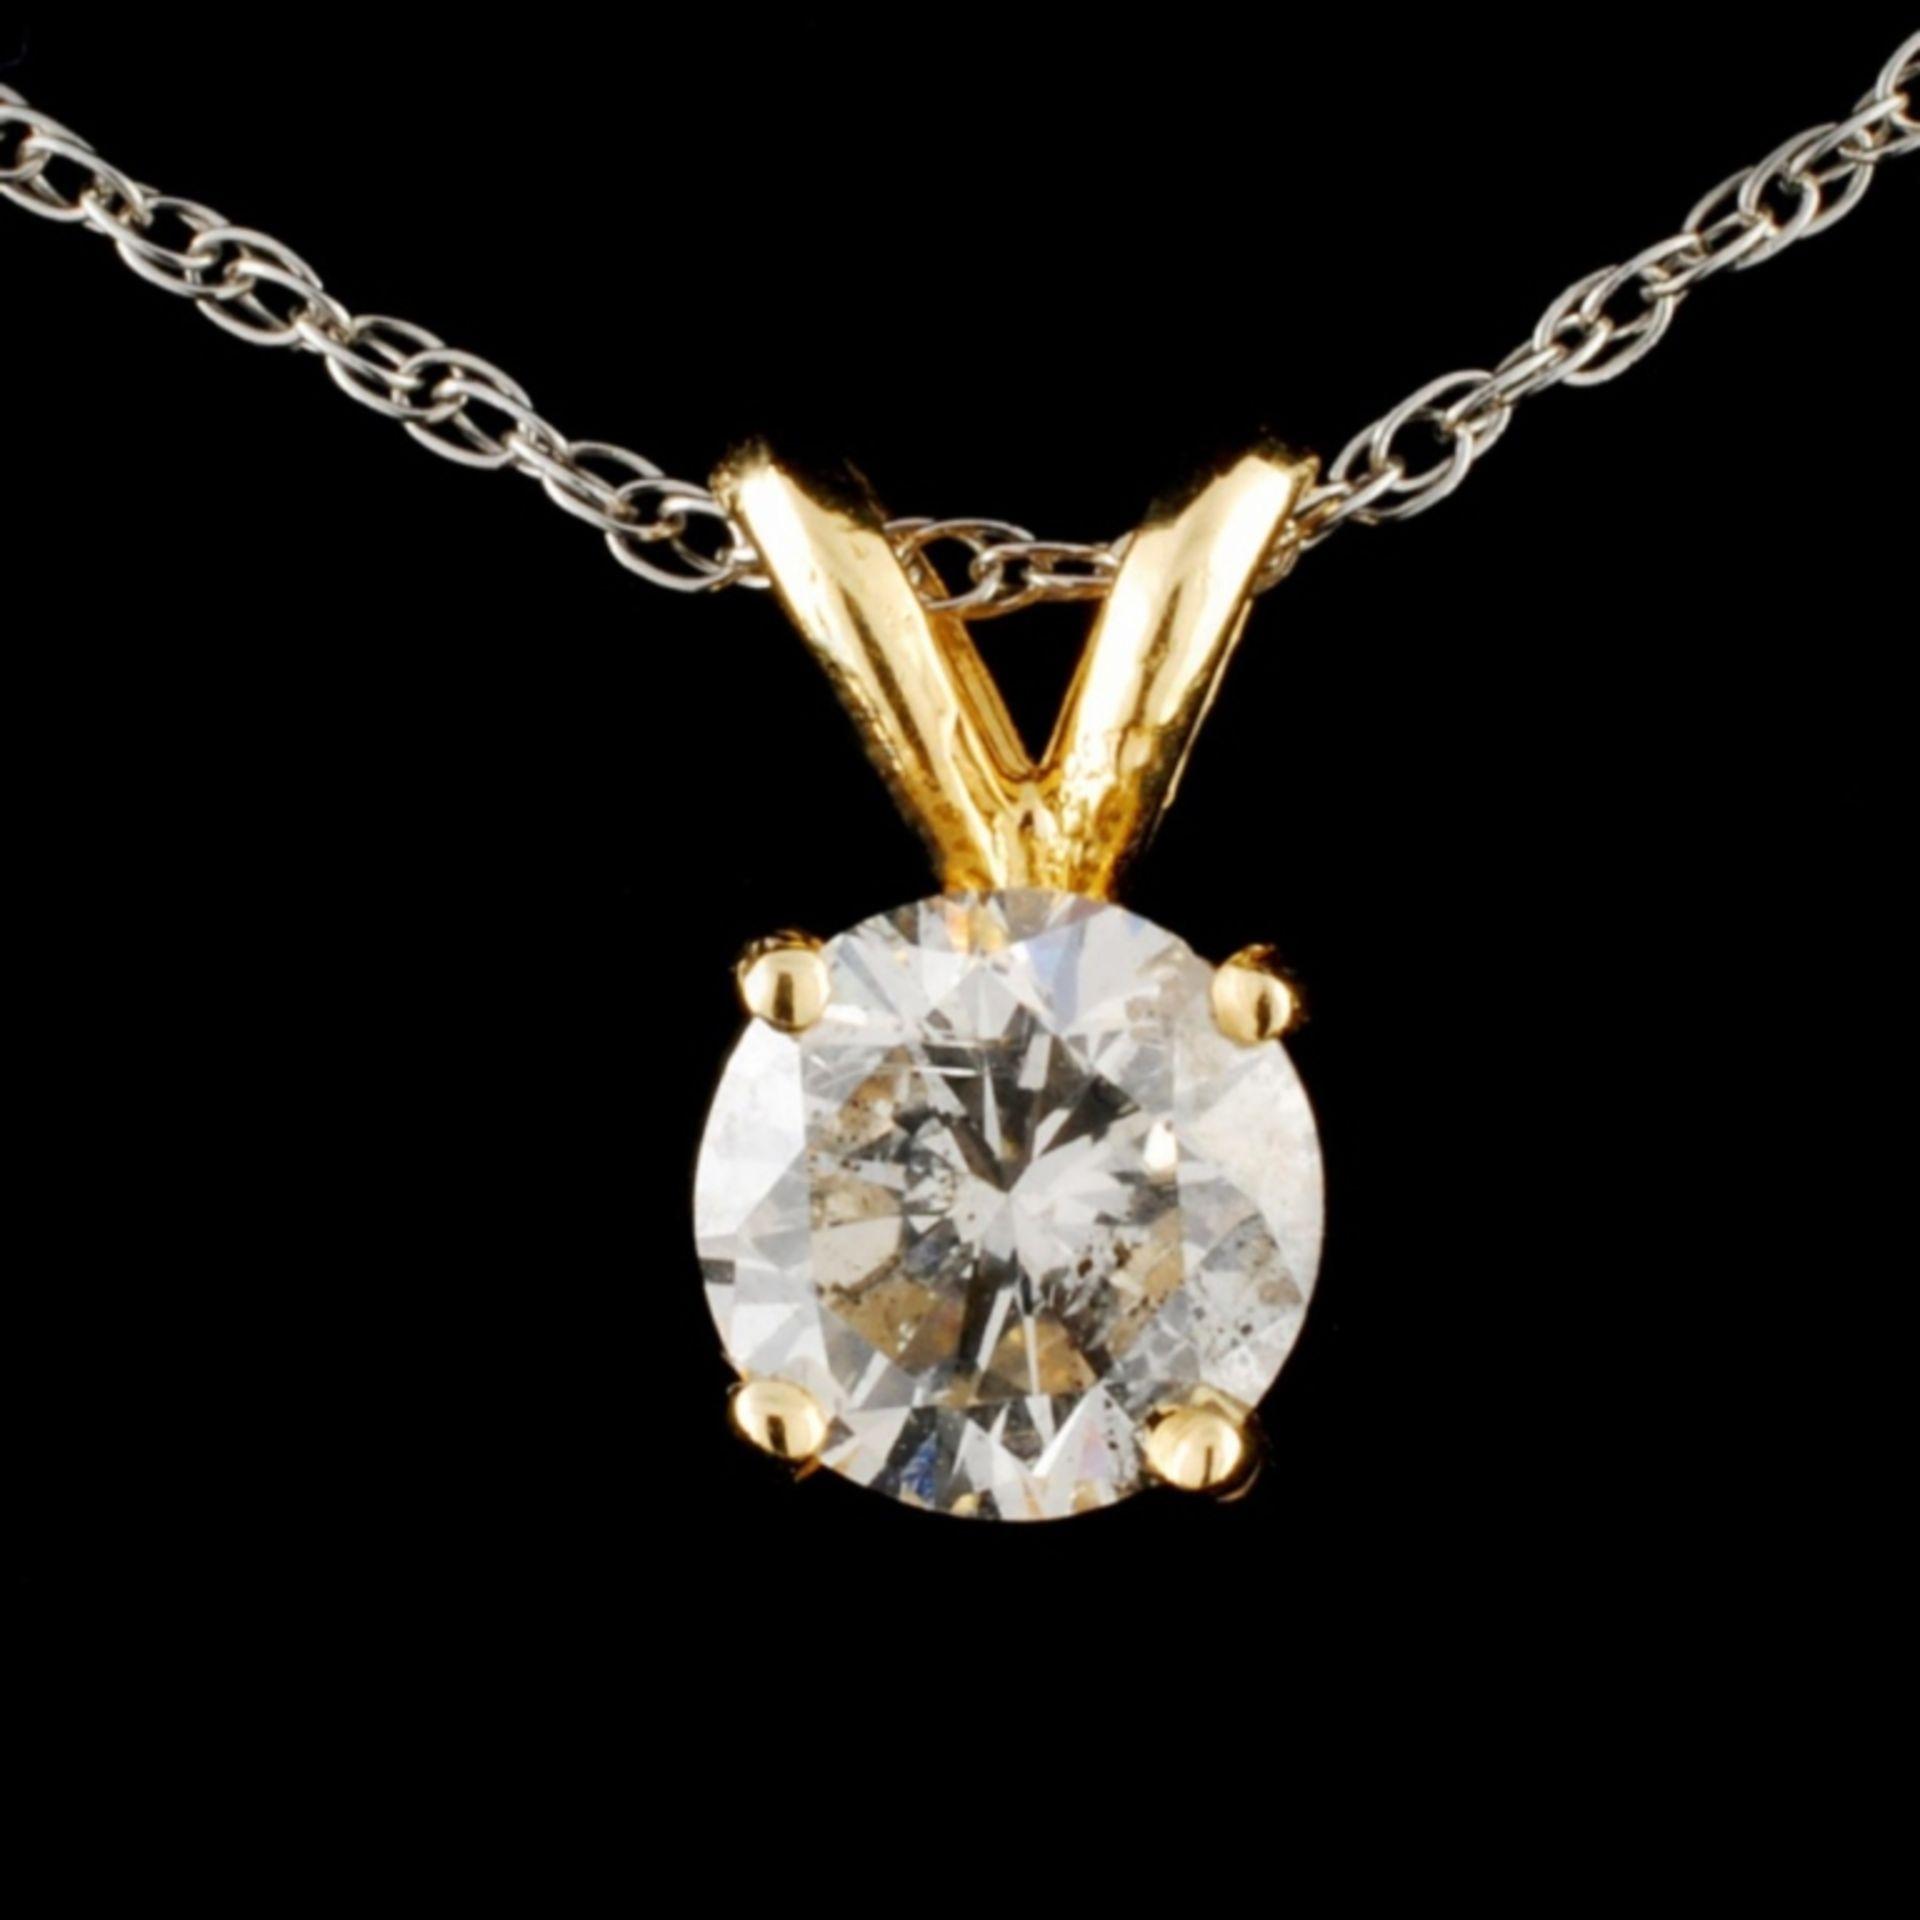 14K Gold 0.67ctw Diamond Pendant